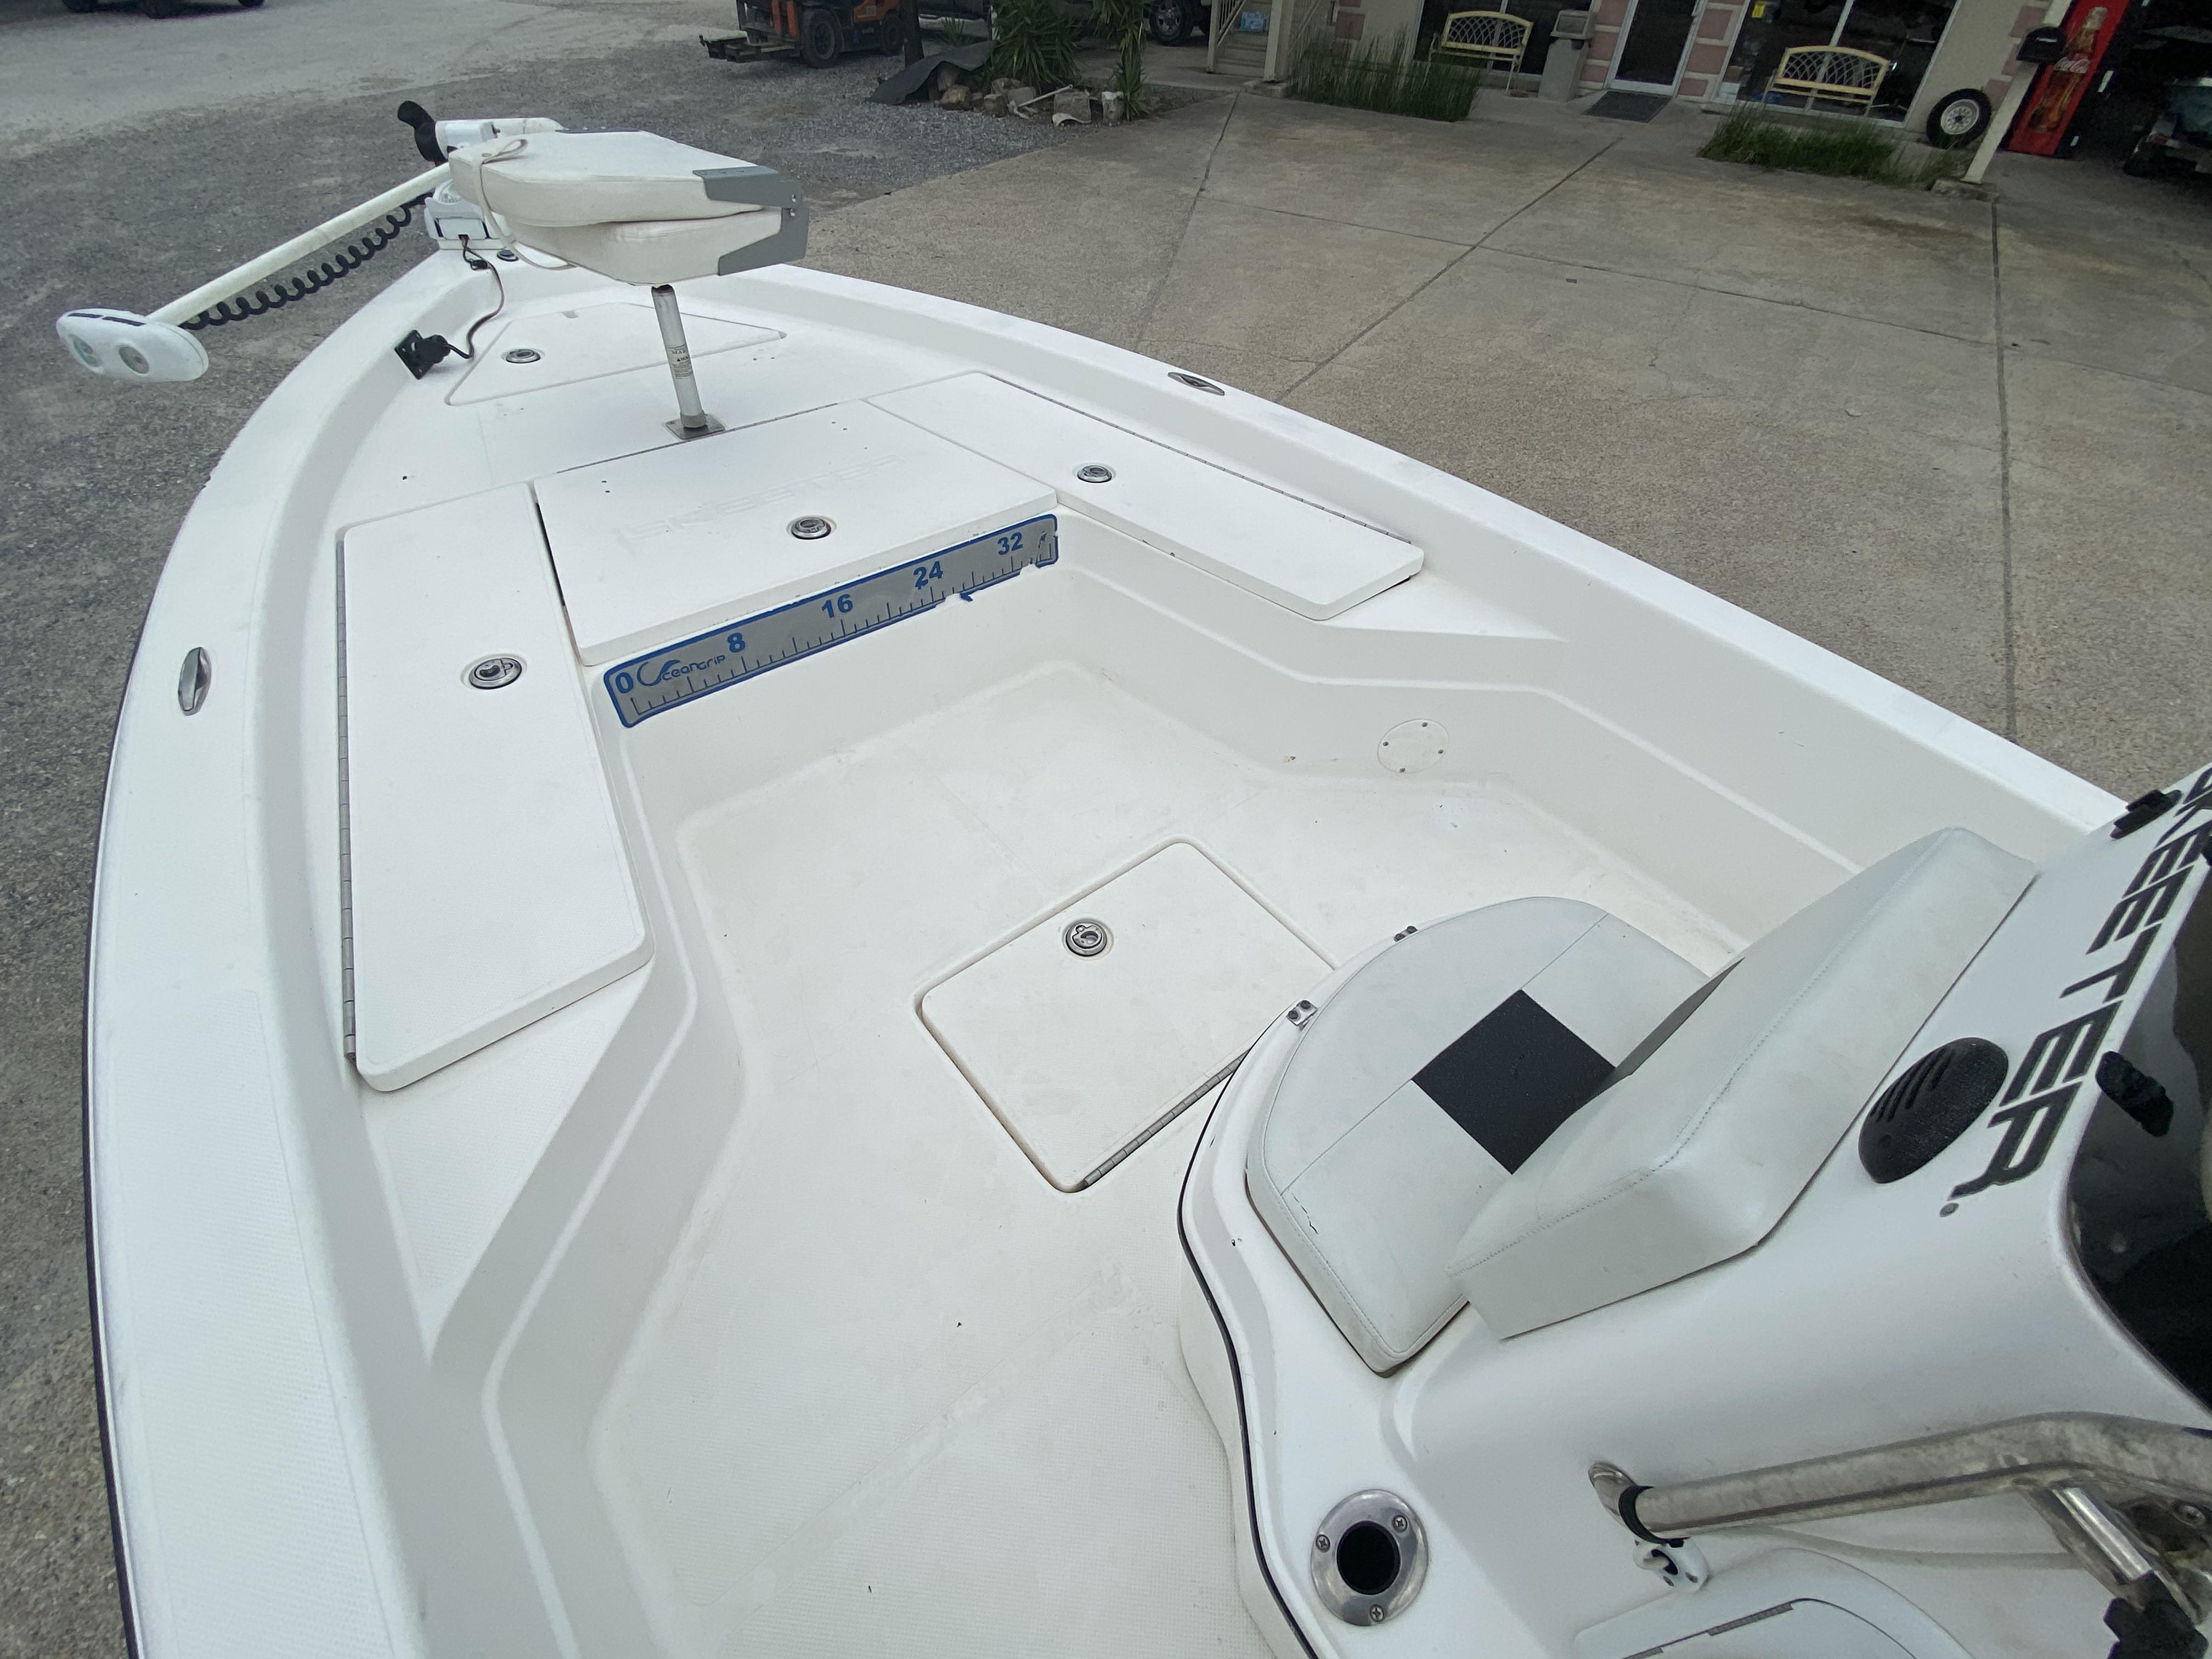 2010 Skeeter boat for sale, model of the boat is ZX 24V & Image # 8 of 18